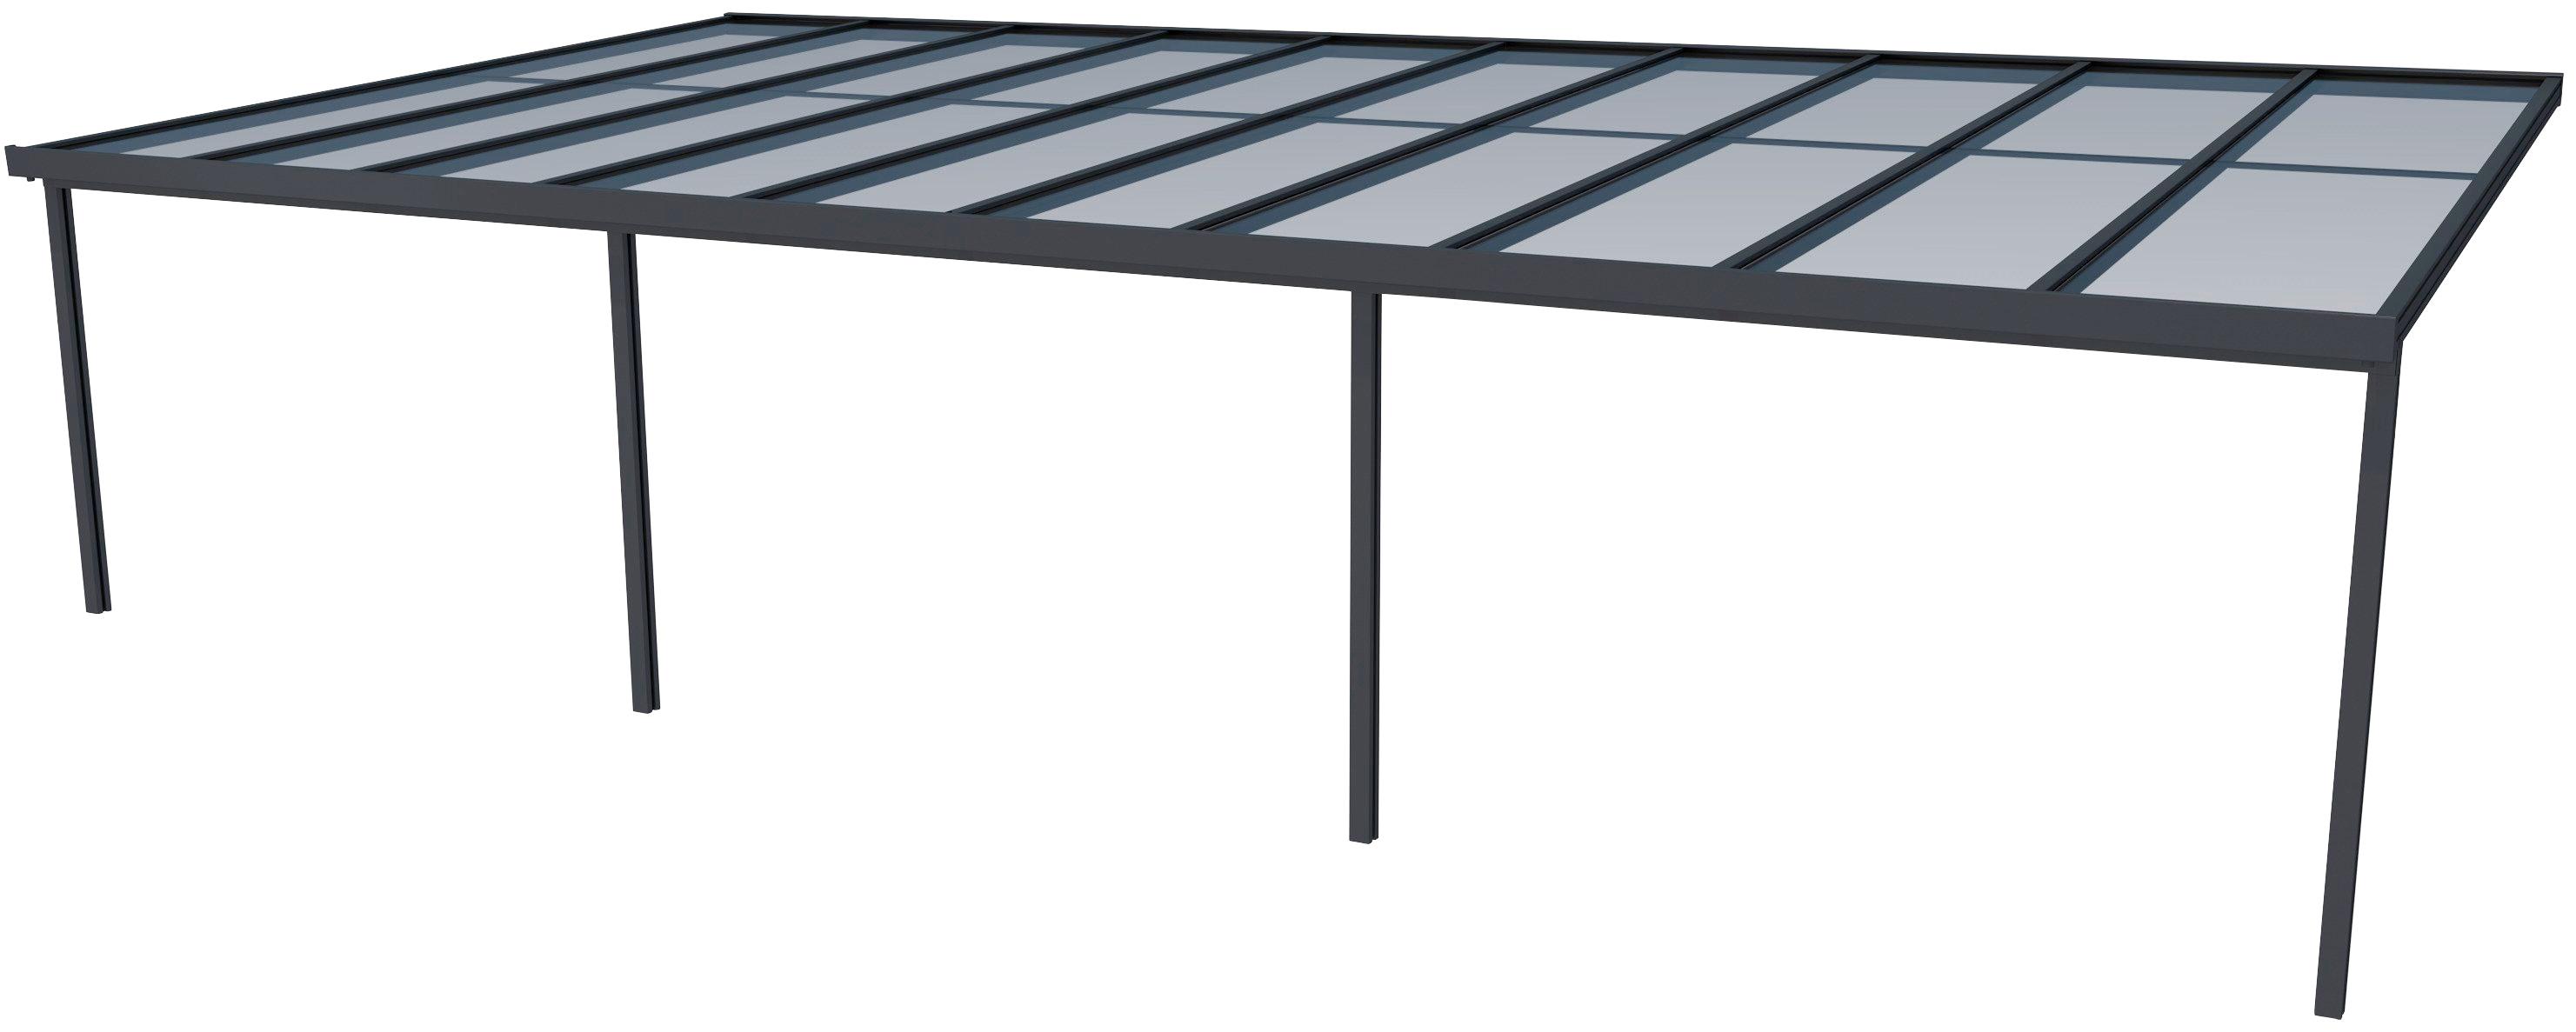 gutta terrassendach premium bxt 1014x506 cm dach acryl klima blue - Peach Binderücken 6mm, A4, blau, 25 Stück, R-PB406-04 , Peach